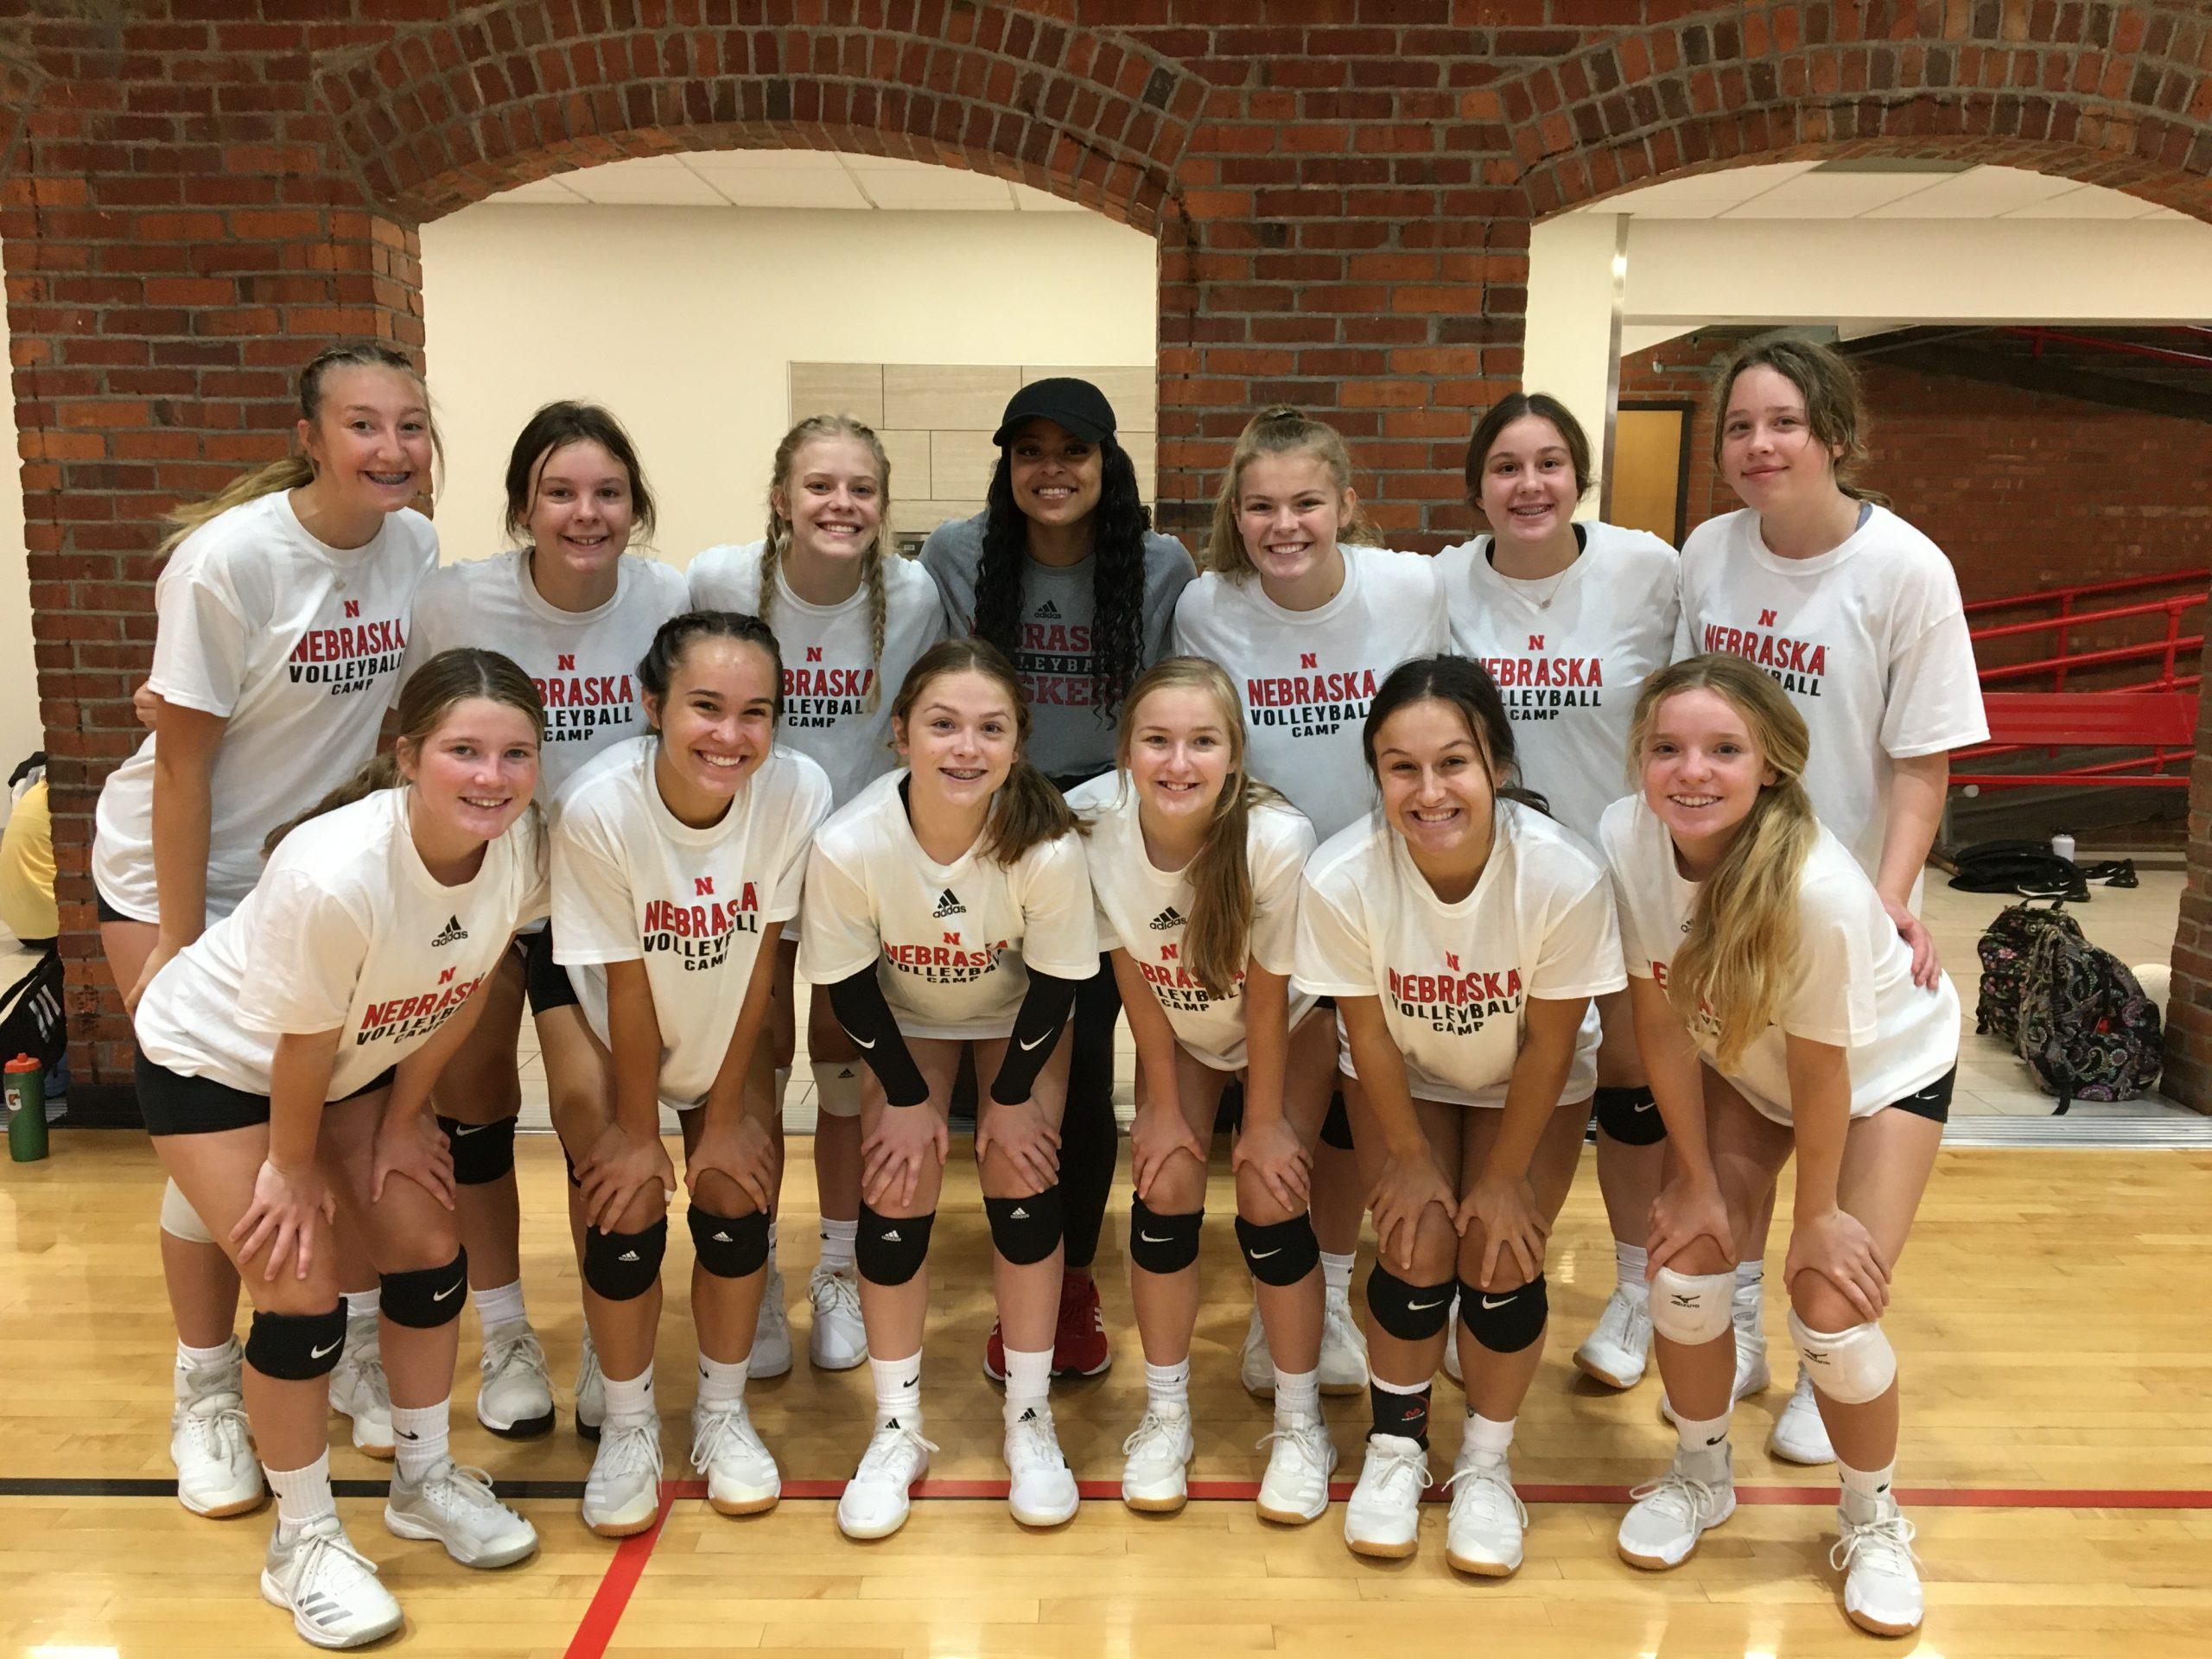 Sedgwick's volleyball camp held in Nebraska